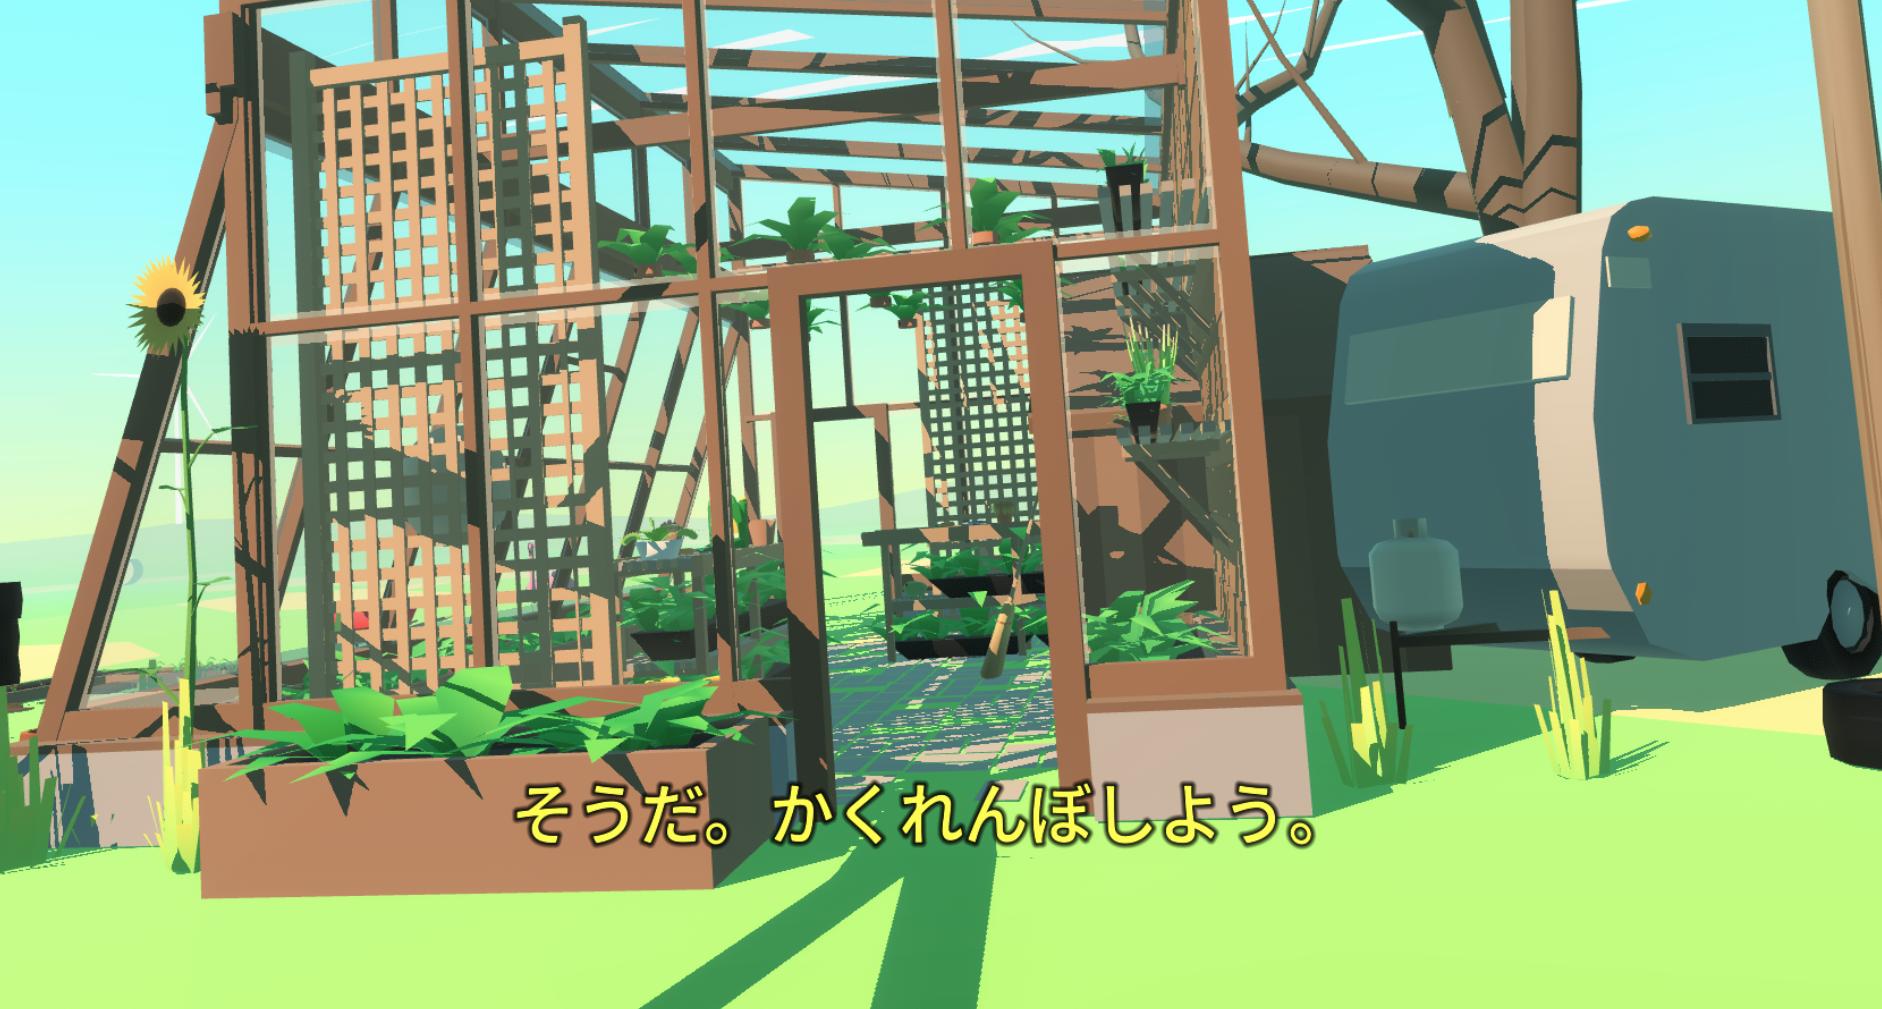 VRゲーム【Virtual Virtual Reality】は内容は怖い?(ネタバレなし)2